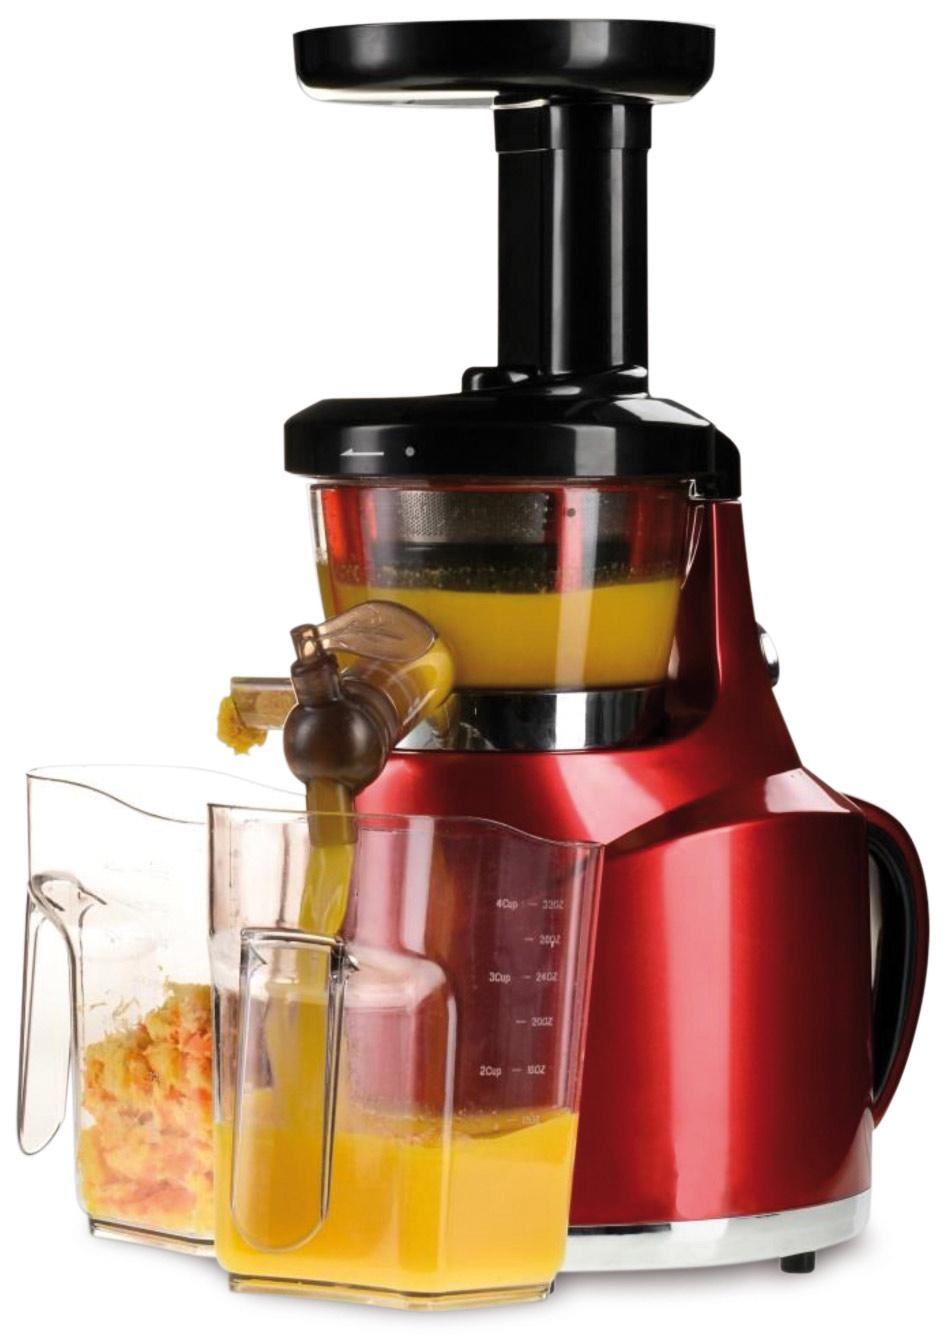 Slow Juicer Wattage : HOWELL Estrattore di Succo Frutta e verdura Slow Juicer Potenza 150 Watt - HO.SJ616 - 127168